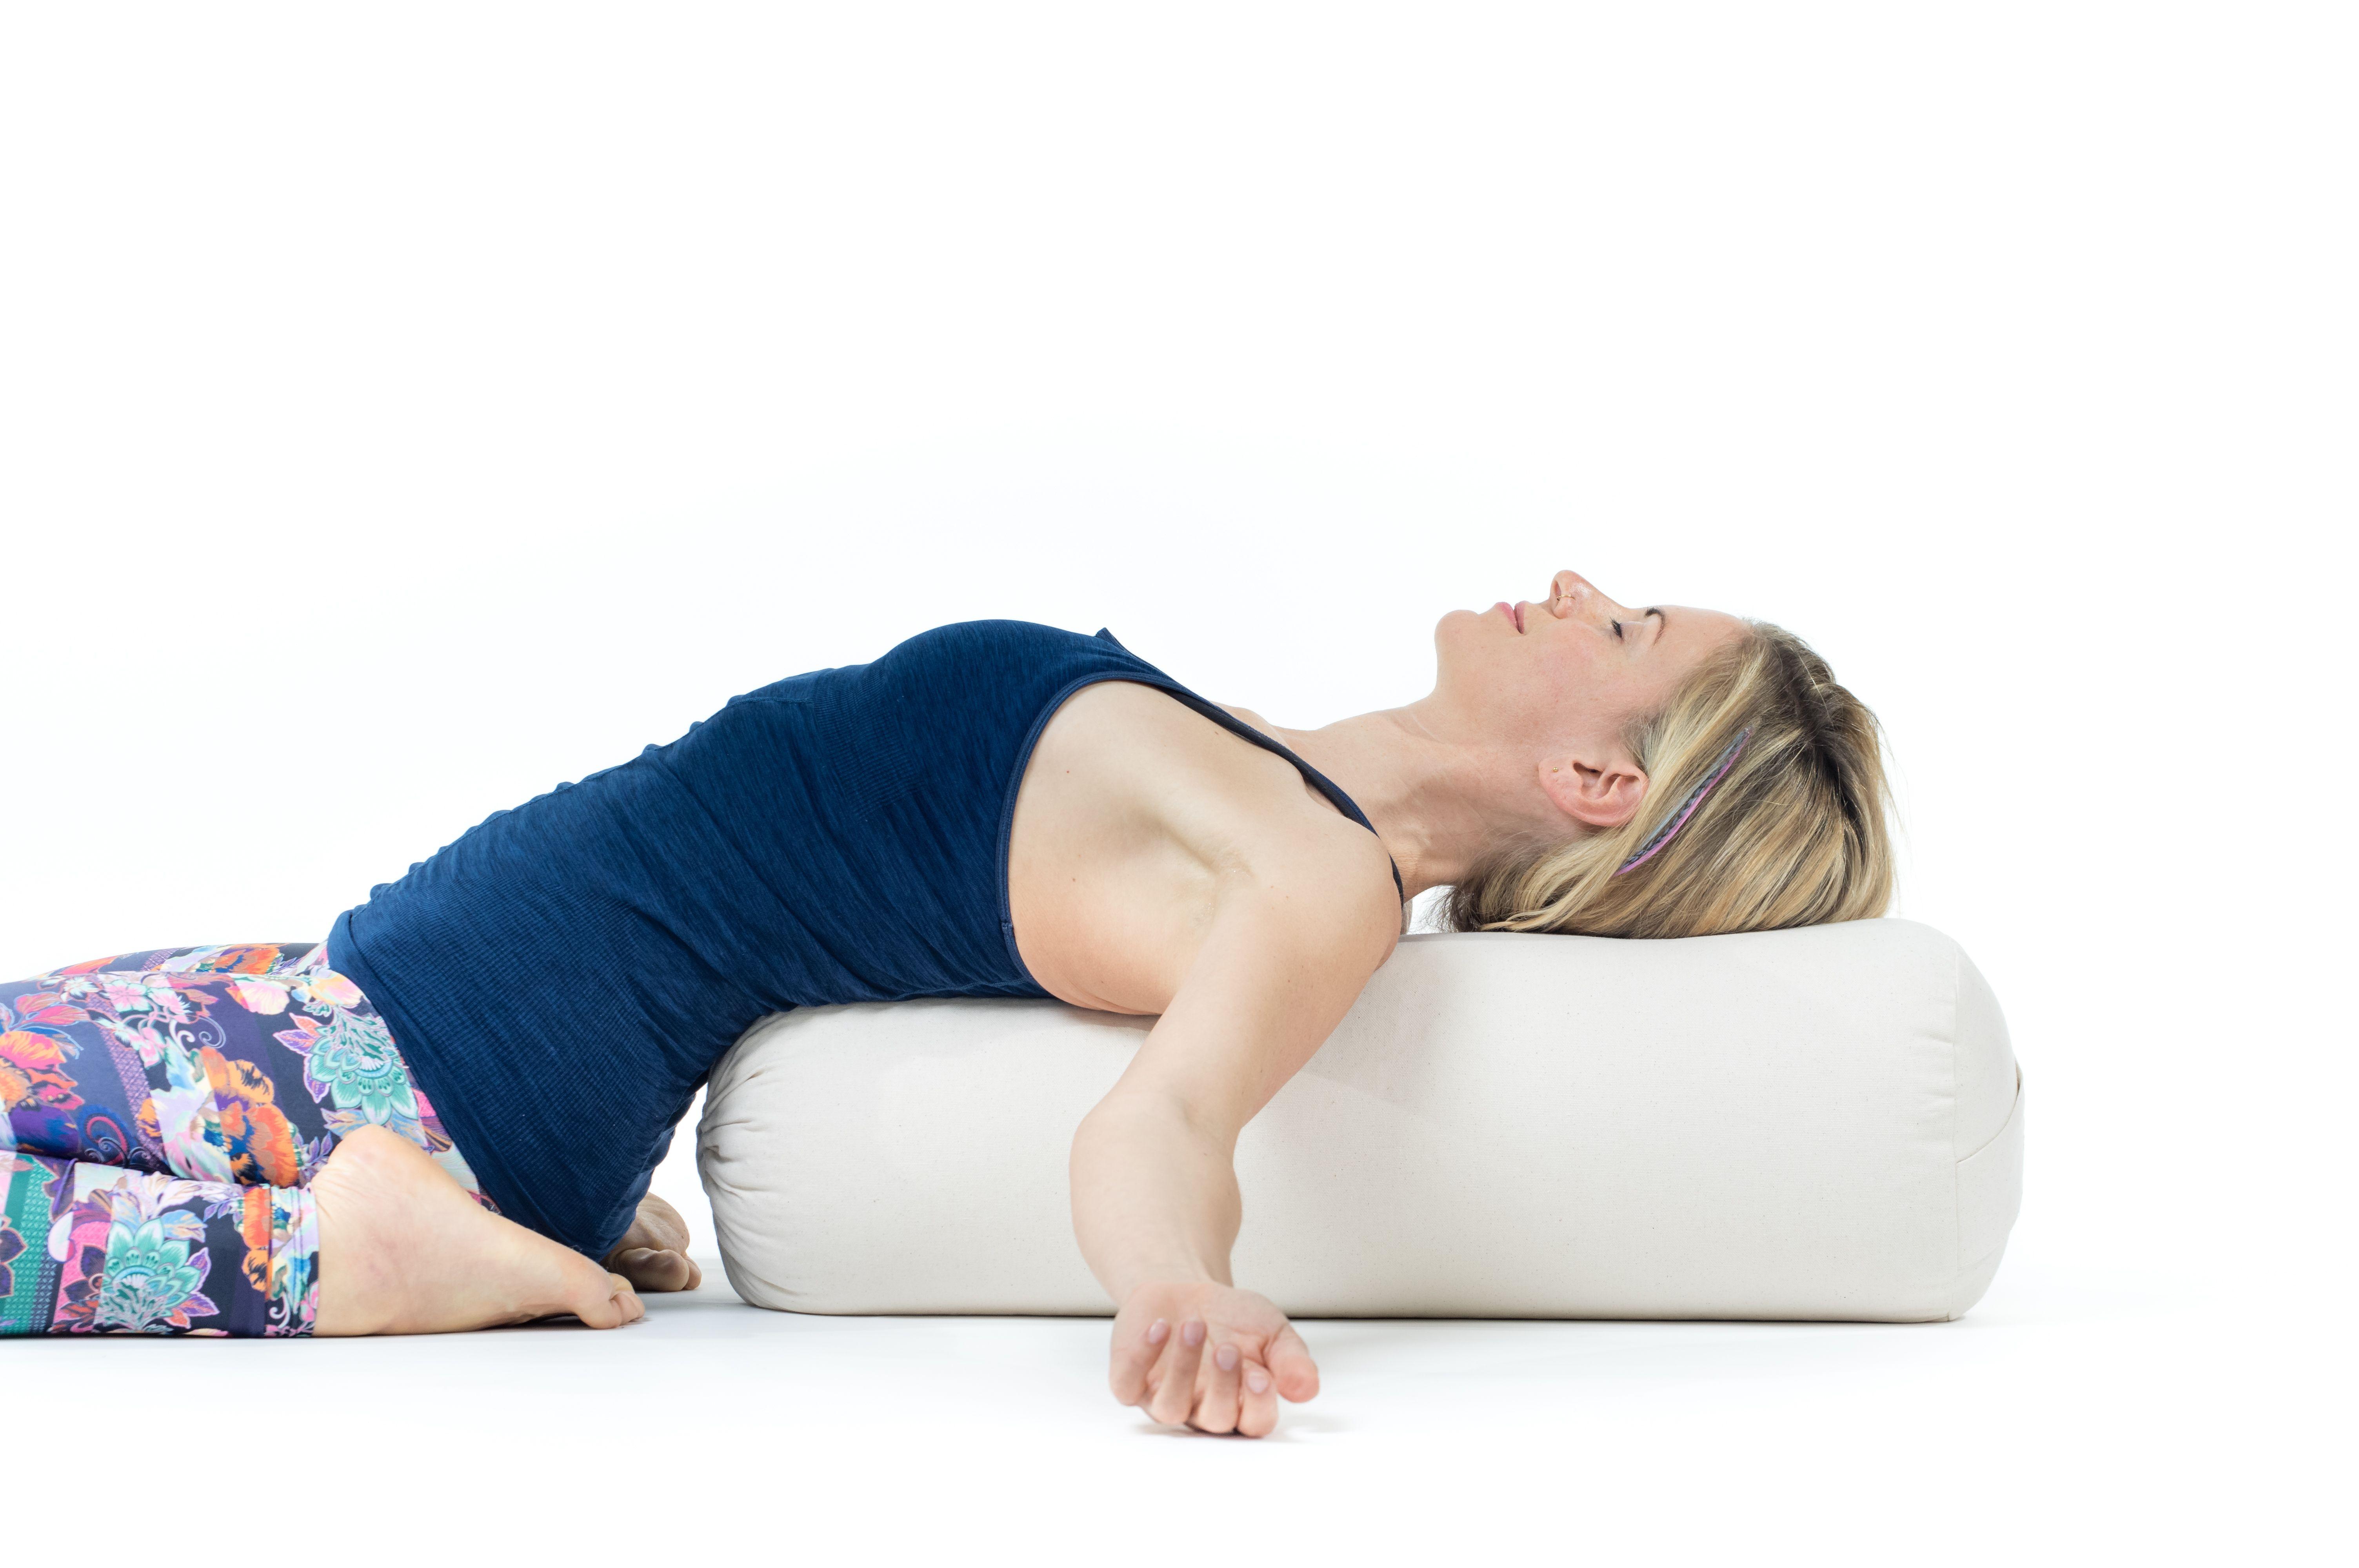 1000+ images about Yin Yoga on Pinterest   Exercise, Yoga bolster ...